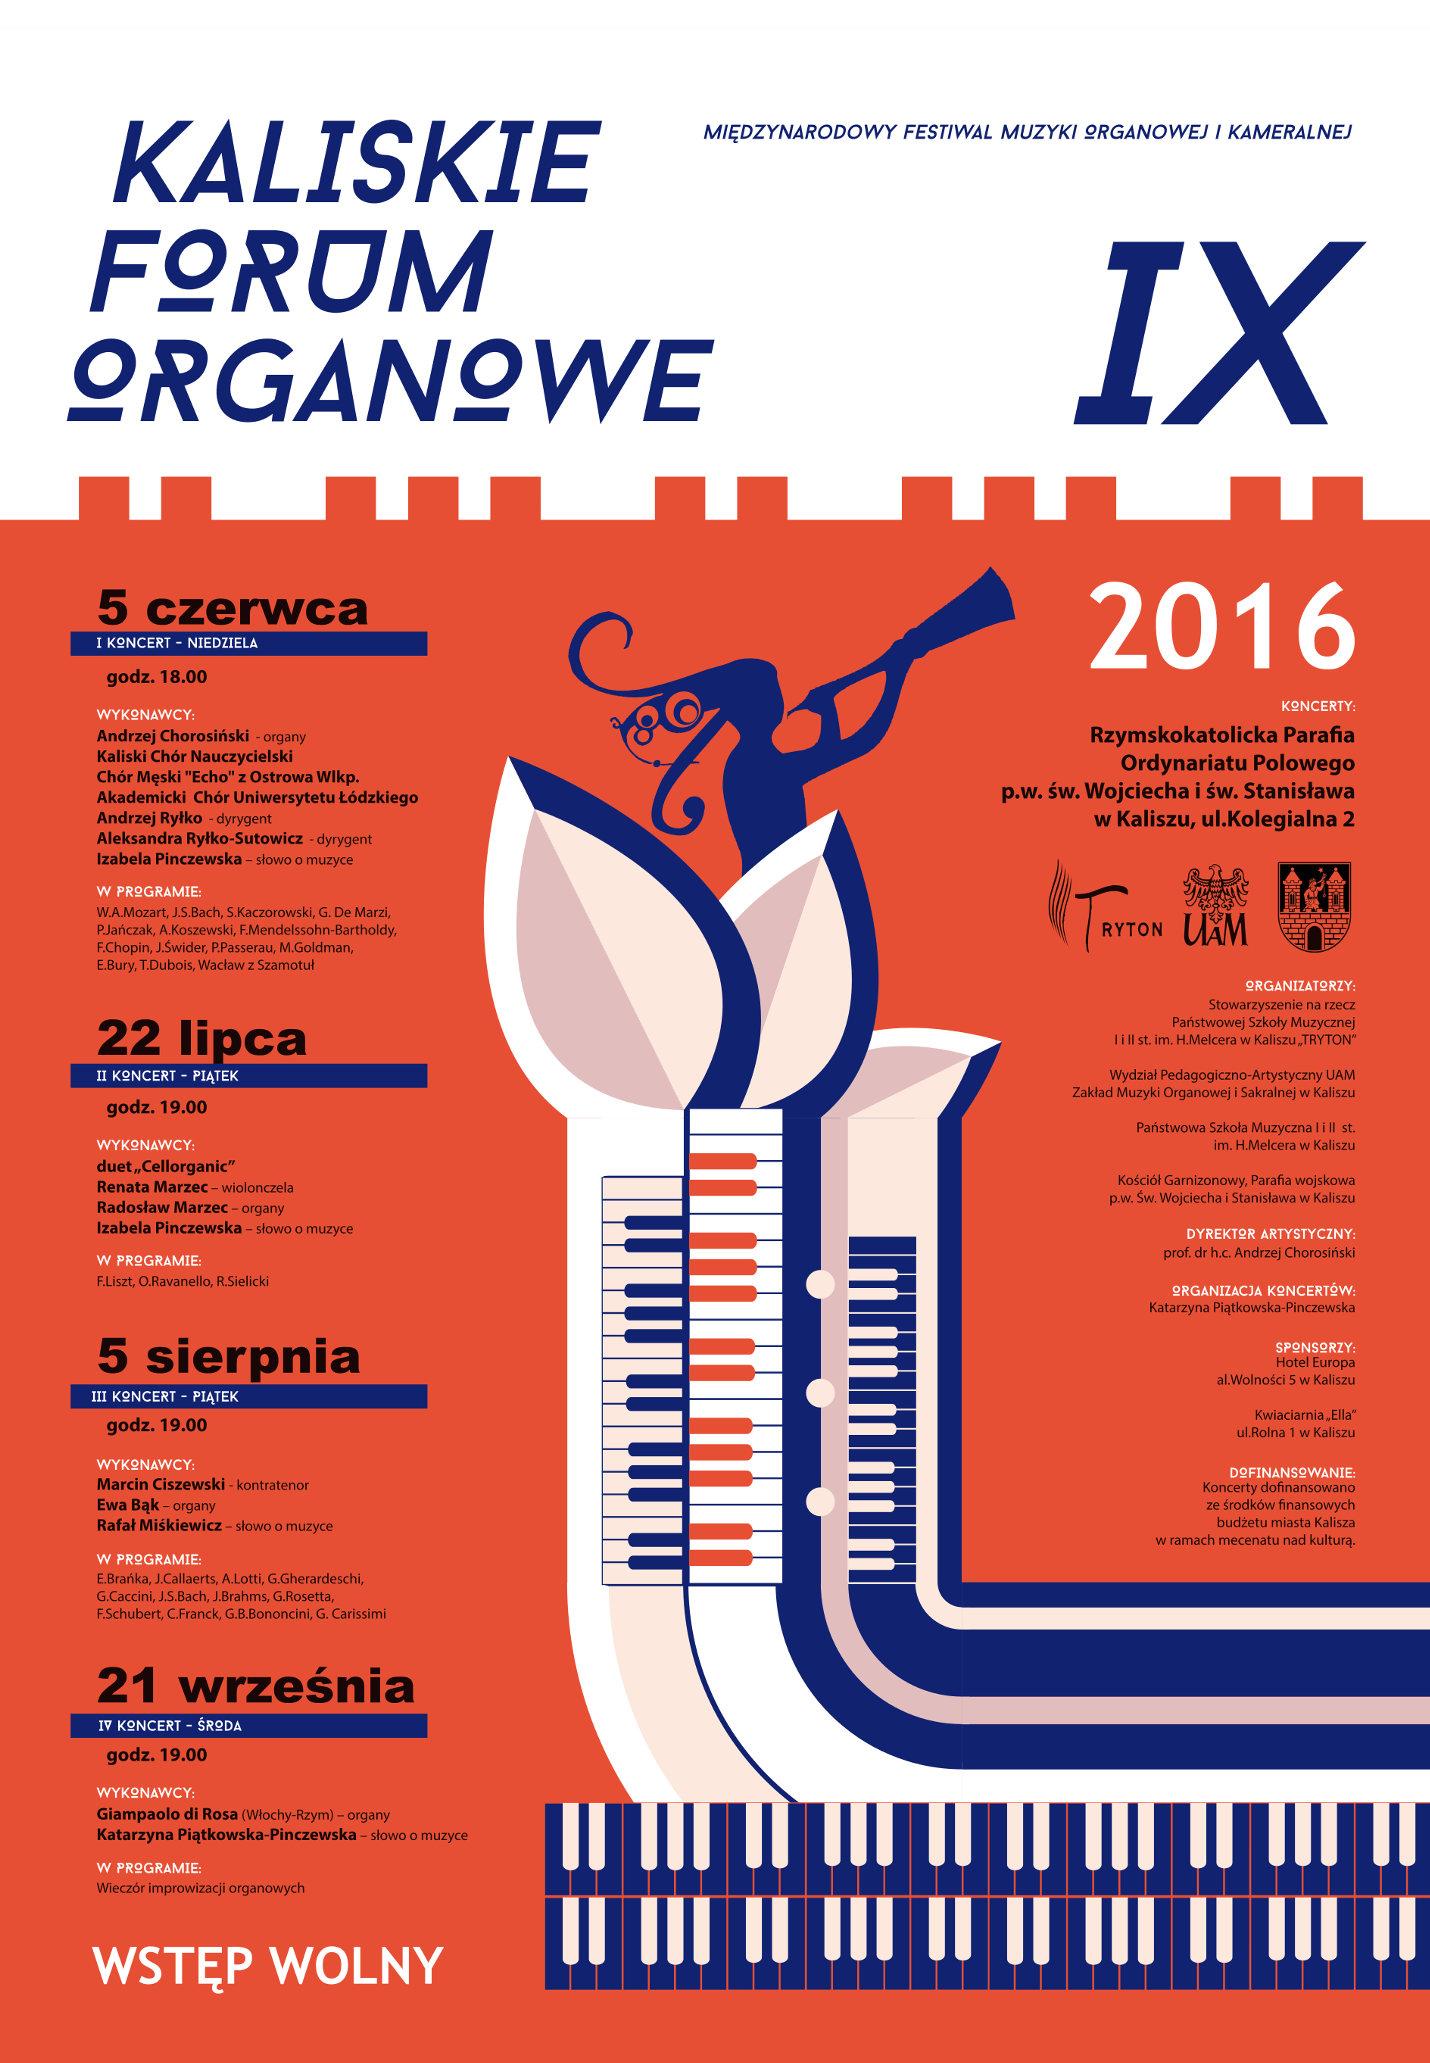 IX Kaliskie forum organowe afisz